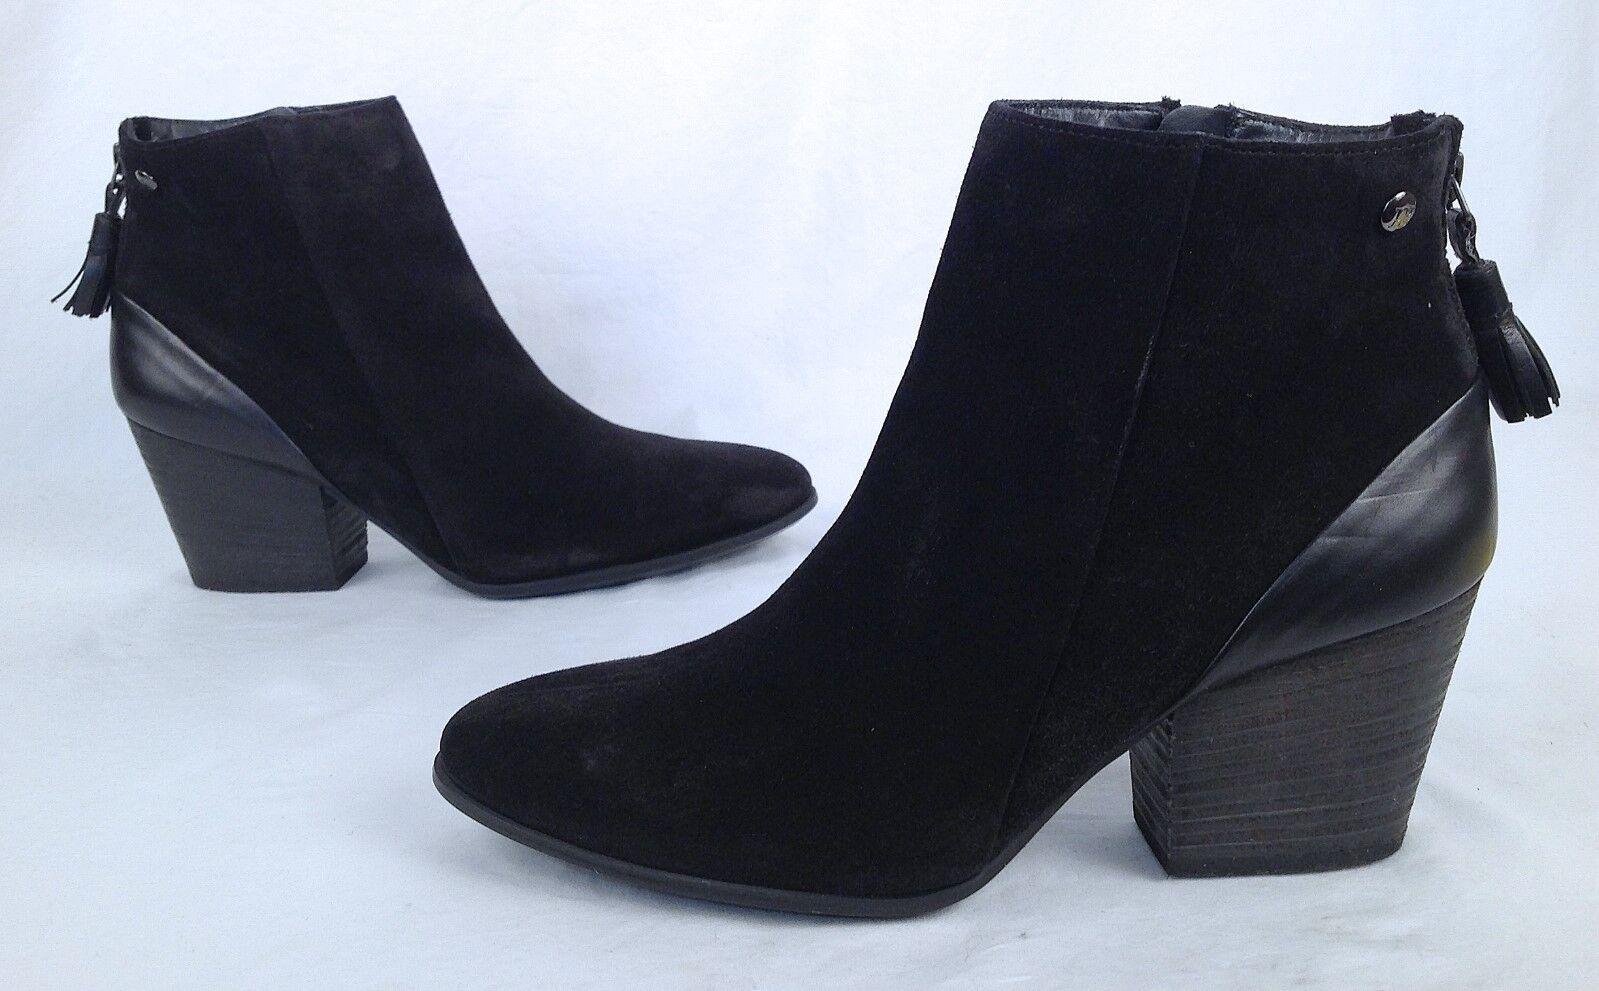 Paul Green Black Suede Bootie- Size 10 US/ 7.5 EU $440-(P10)